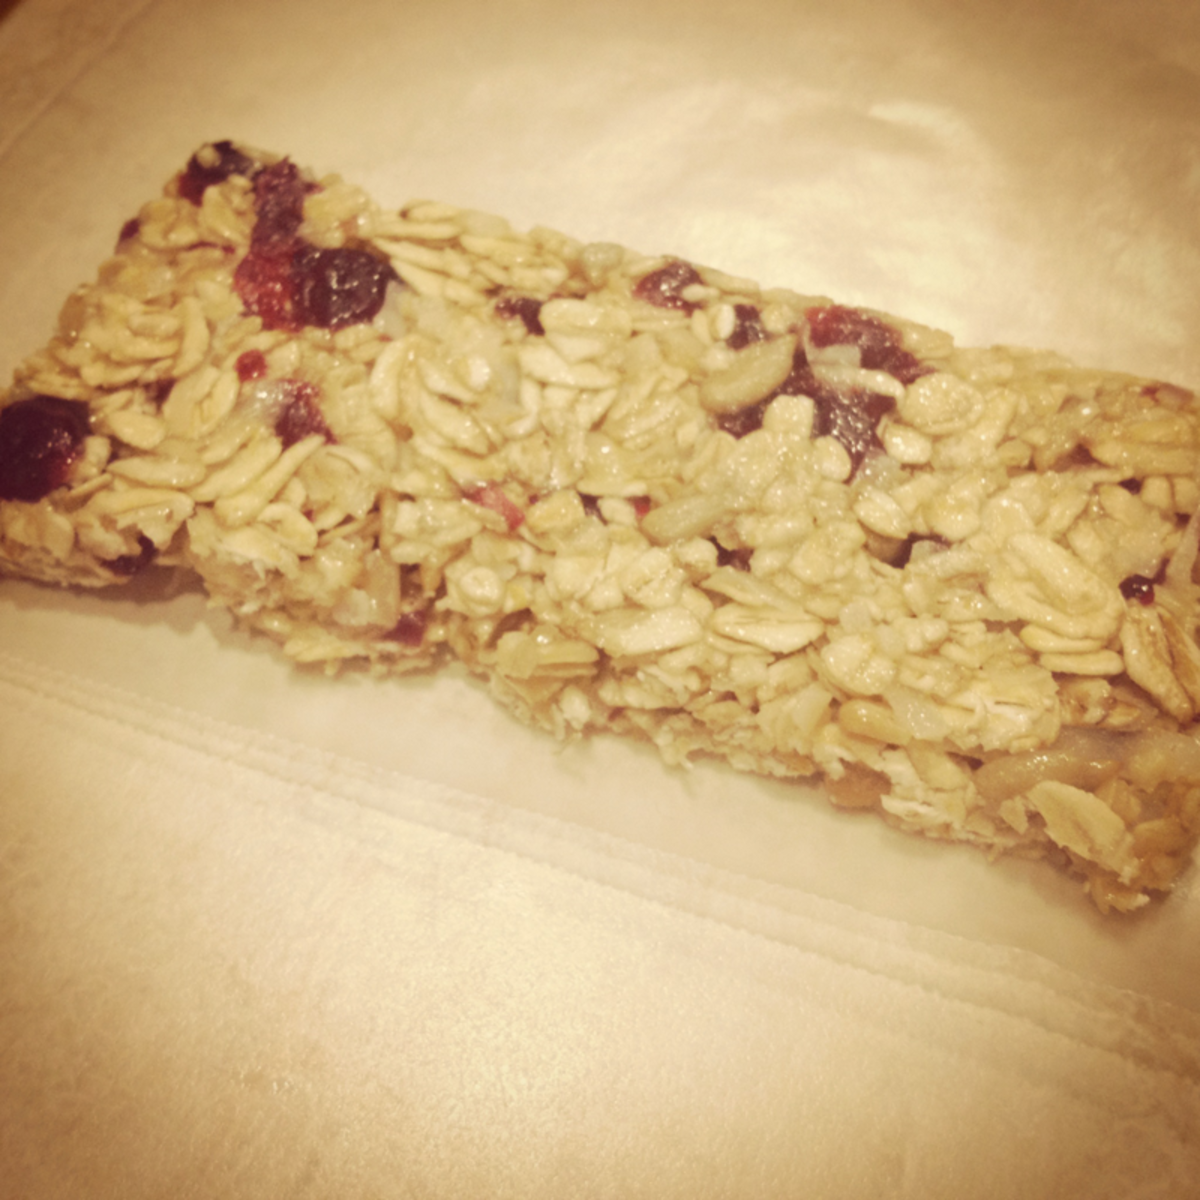 Cranberry oatmeal bars: a homemade, delicious granola bar snack.